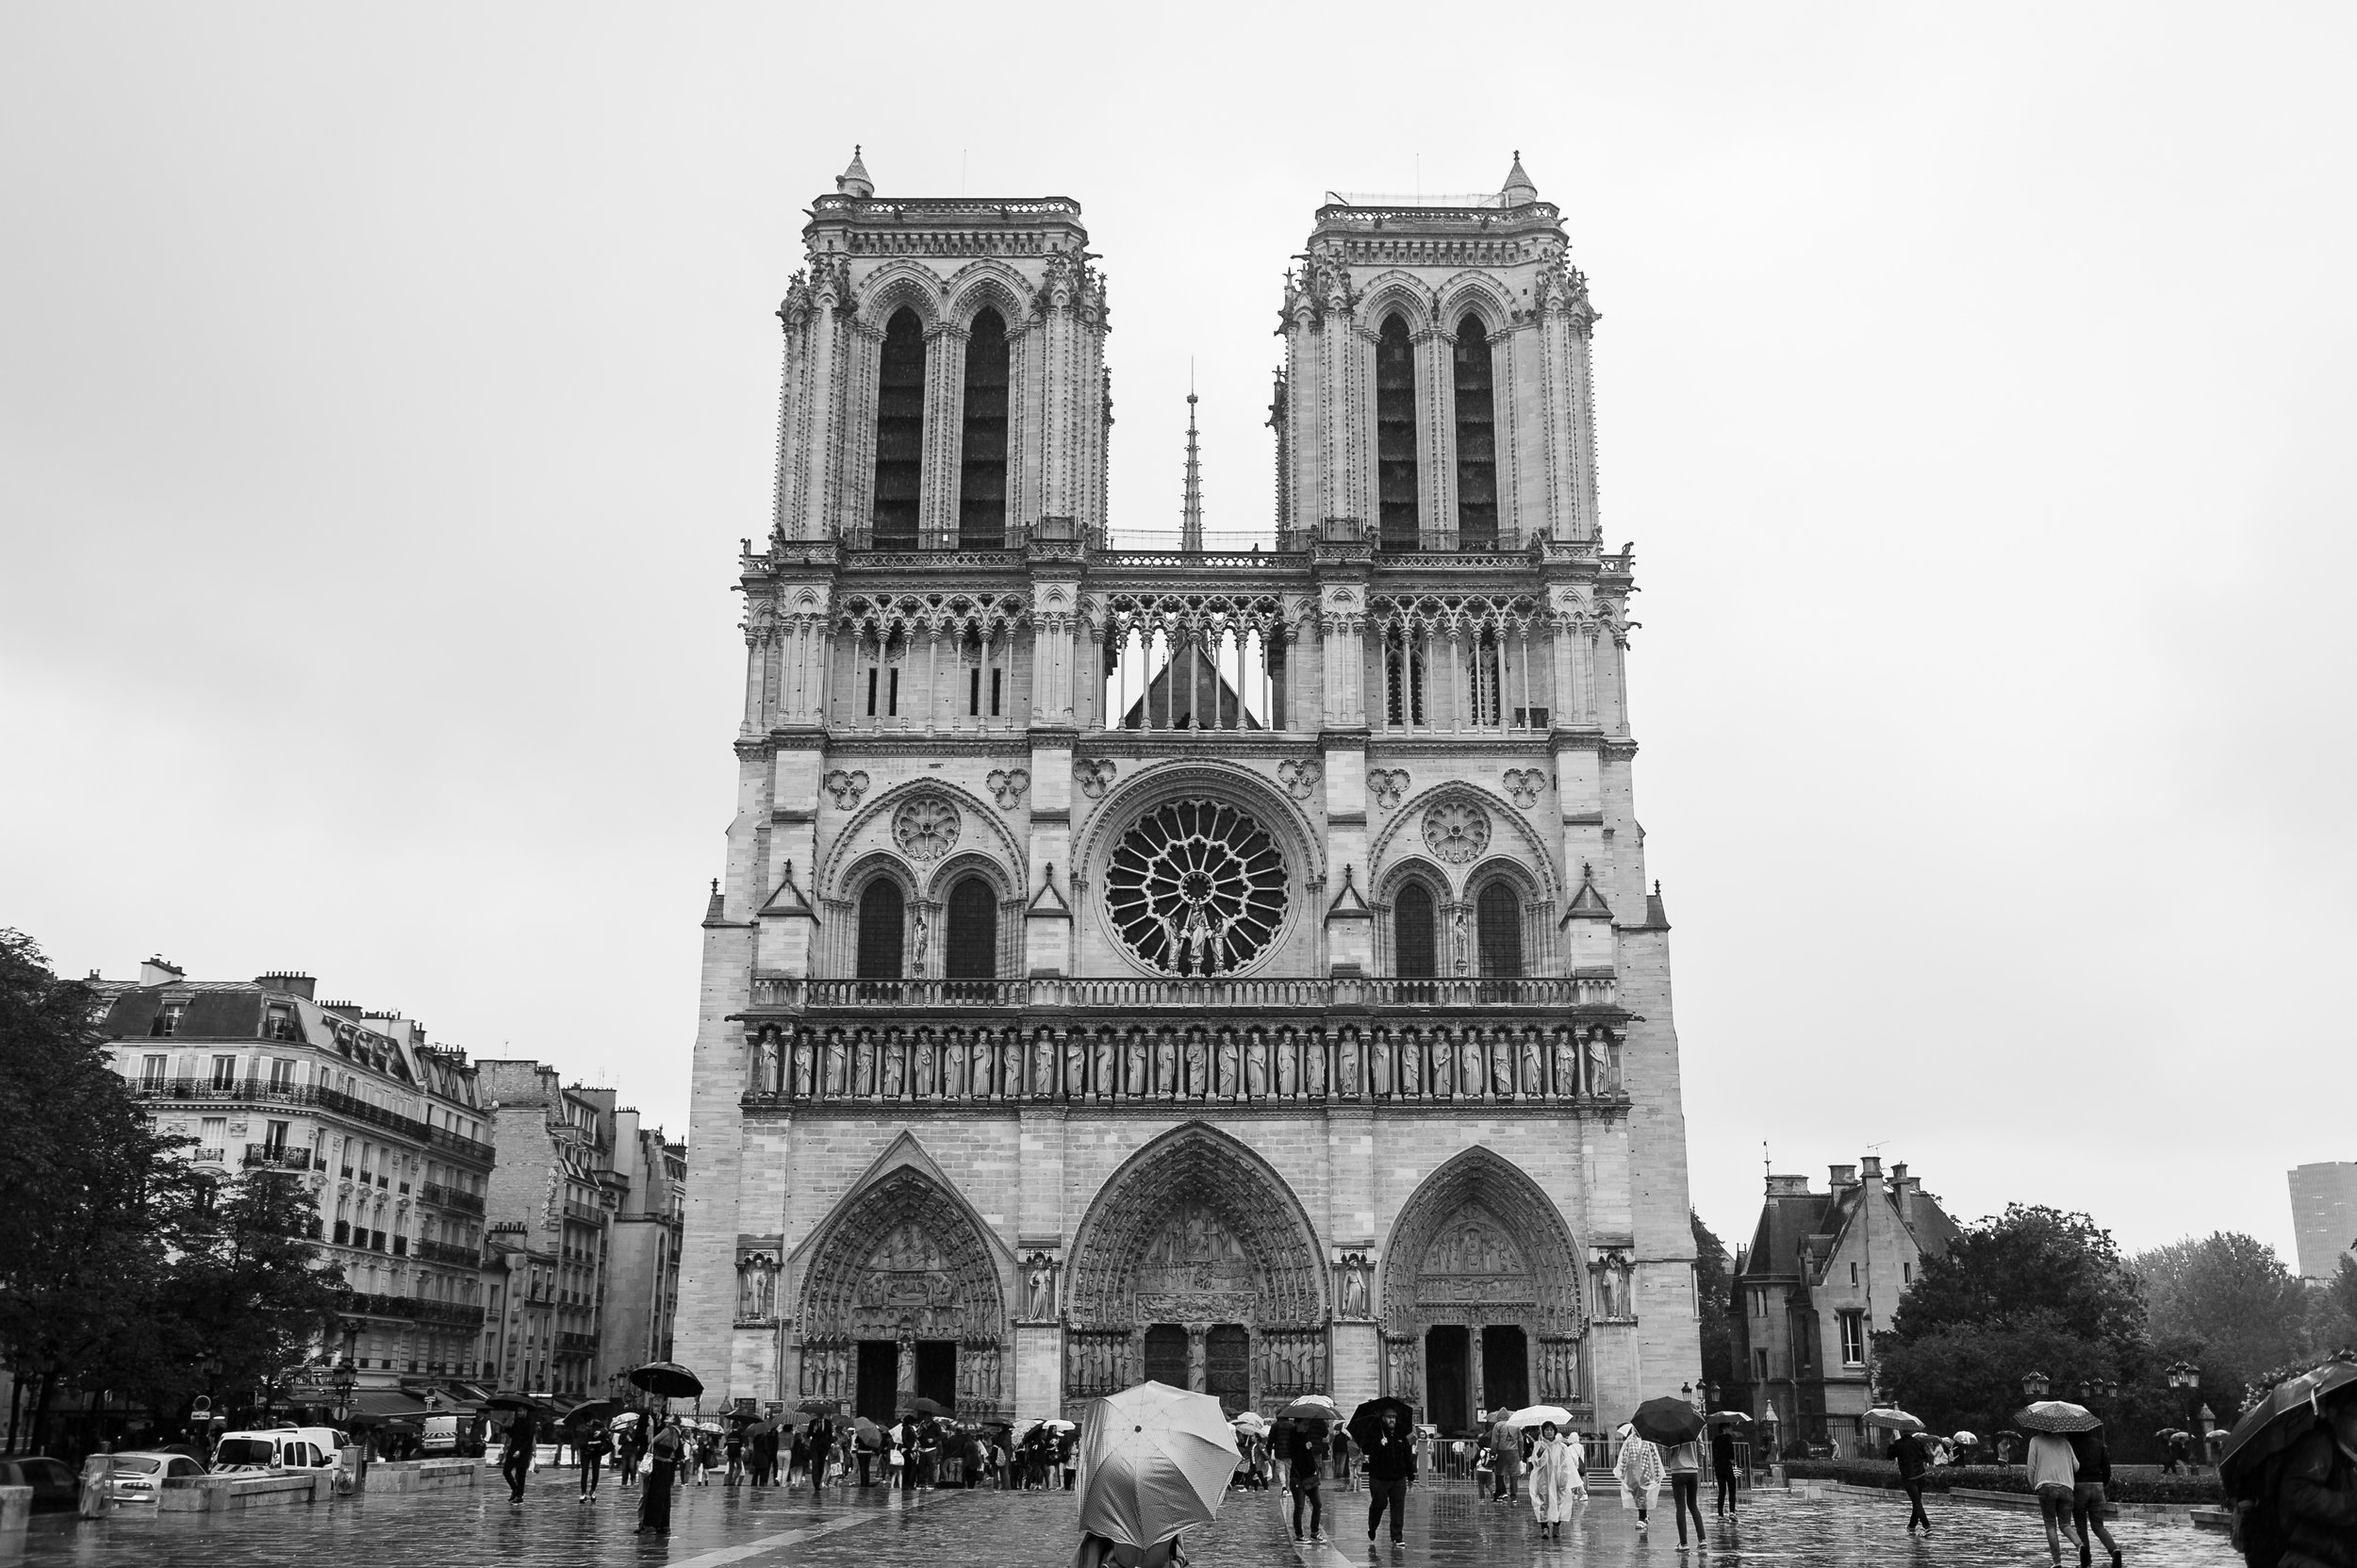 Notre Dame // 2015